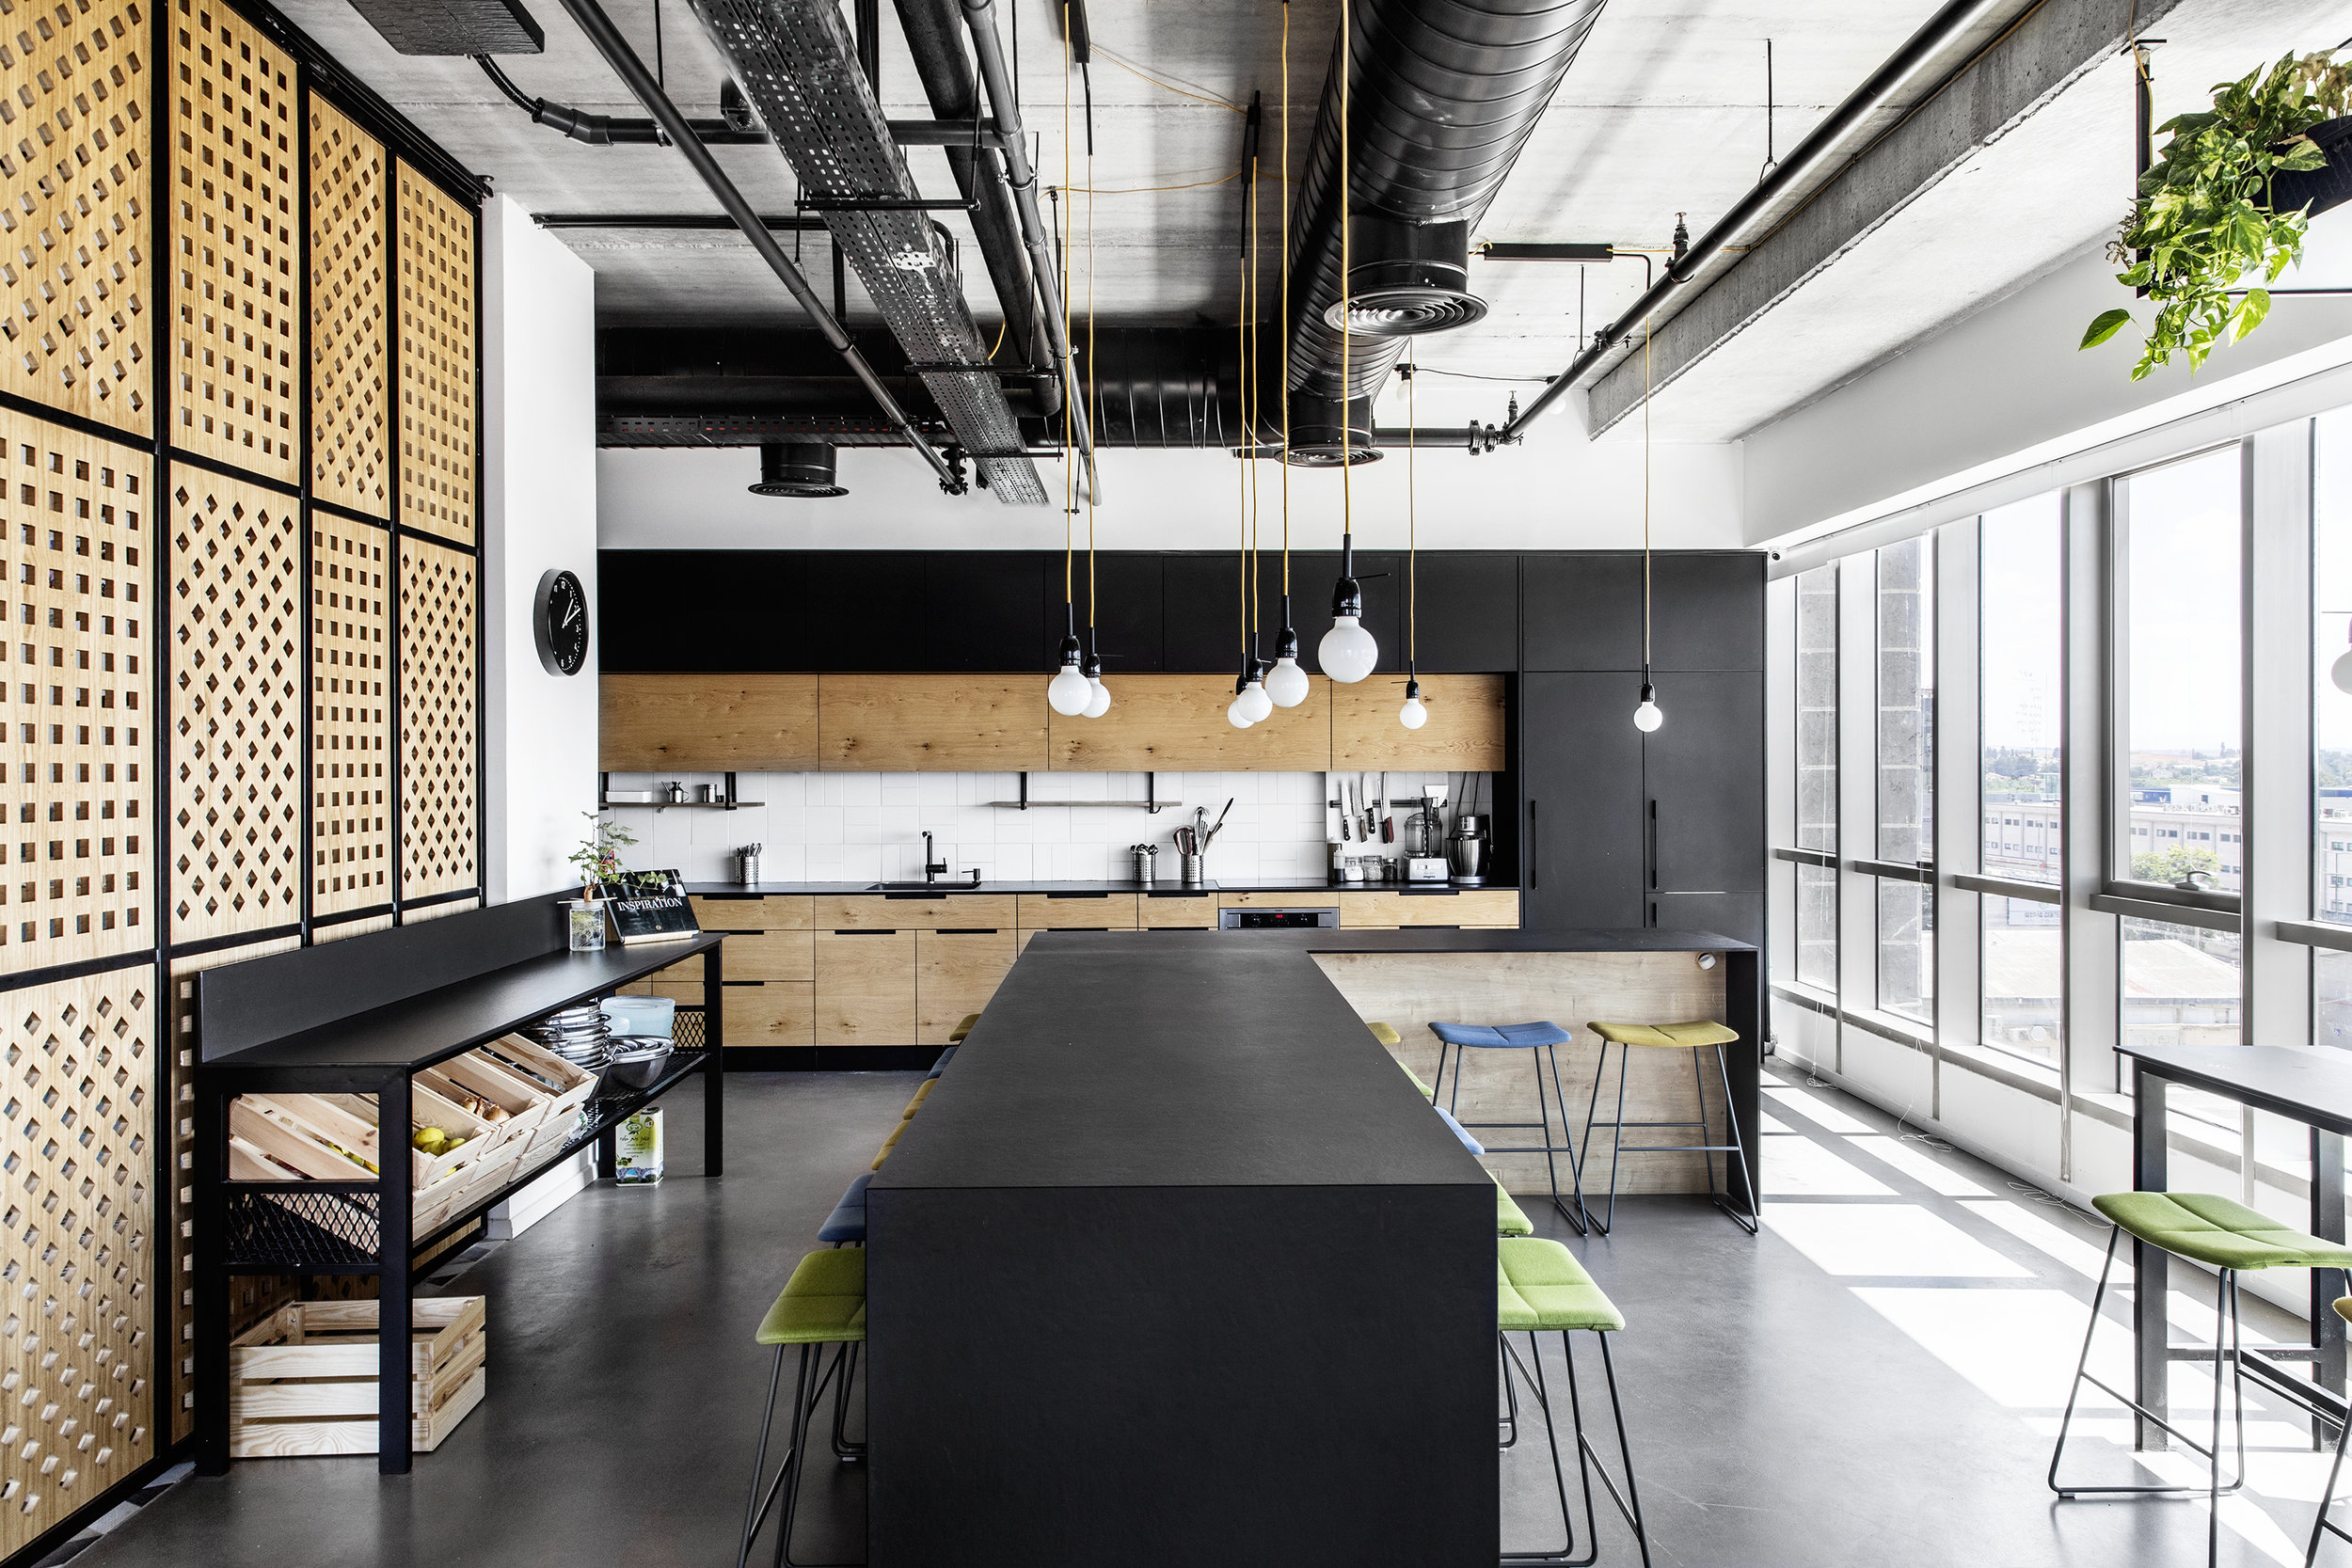 ROY DAVID ARCHITECTURE - STUDIO - ART MEDICAL OFFICES - רואי דוד אדריכלים - סטודיו רואי דוד - אדריכלות - ארט מדיקל (29).jpg